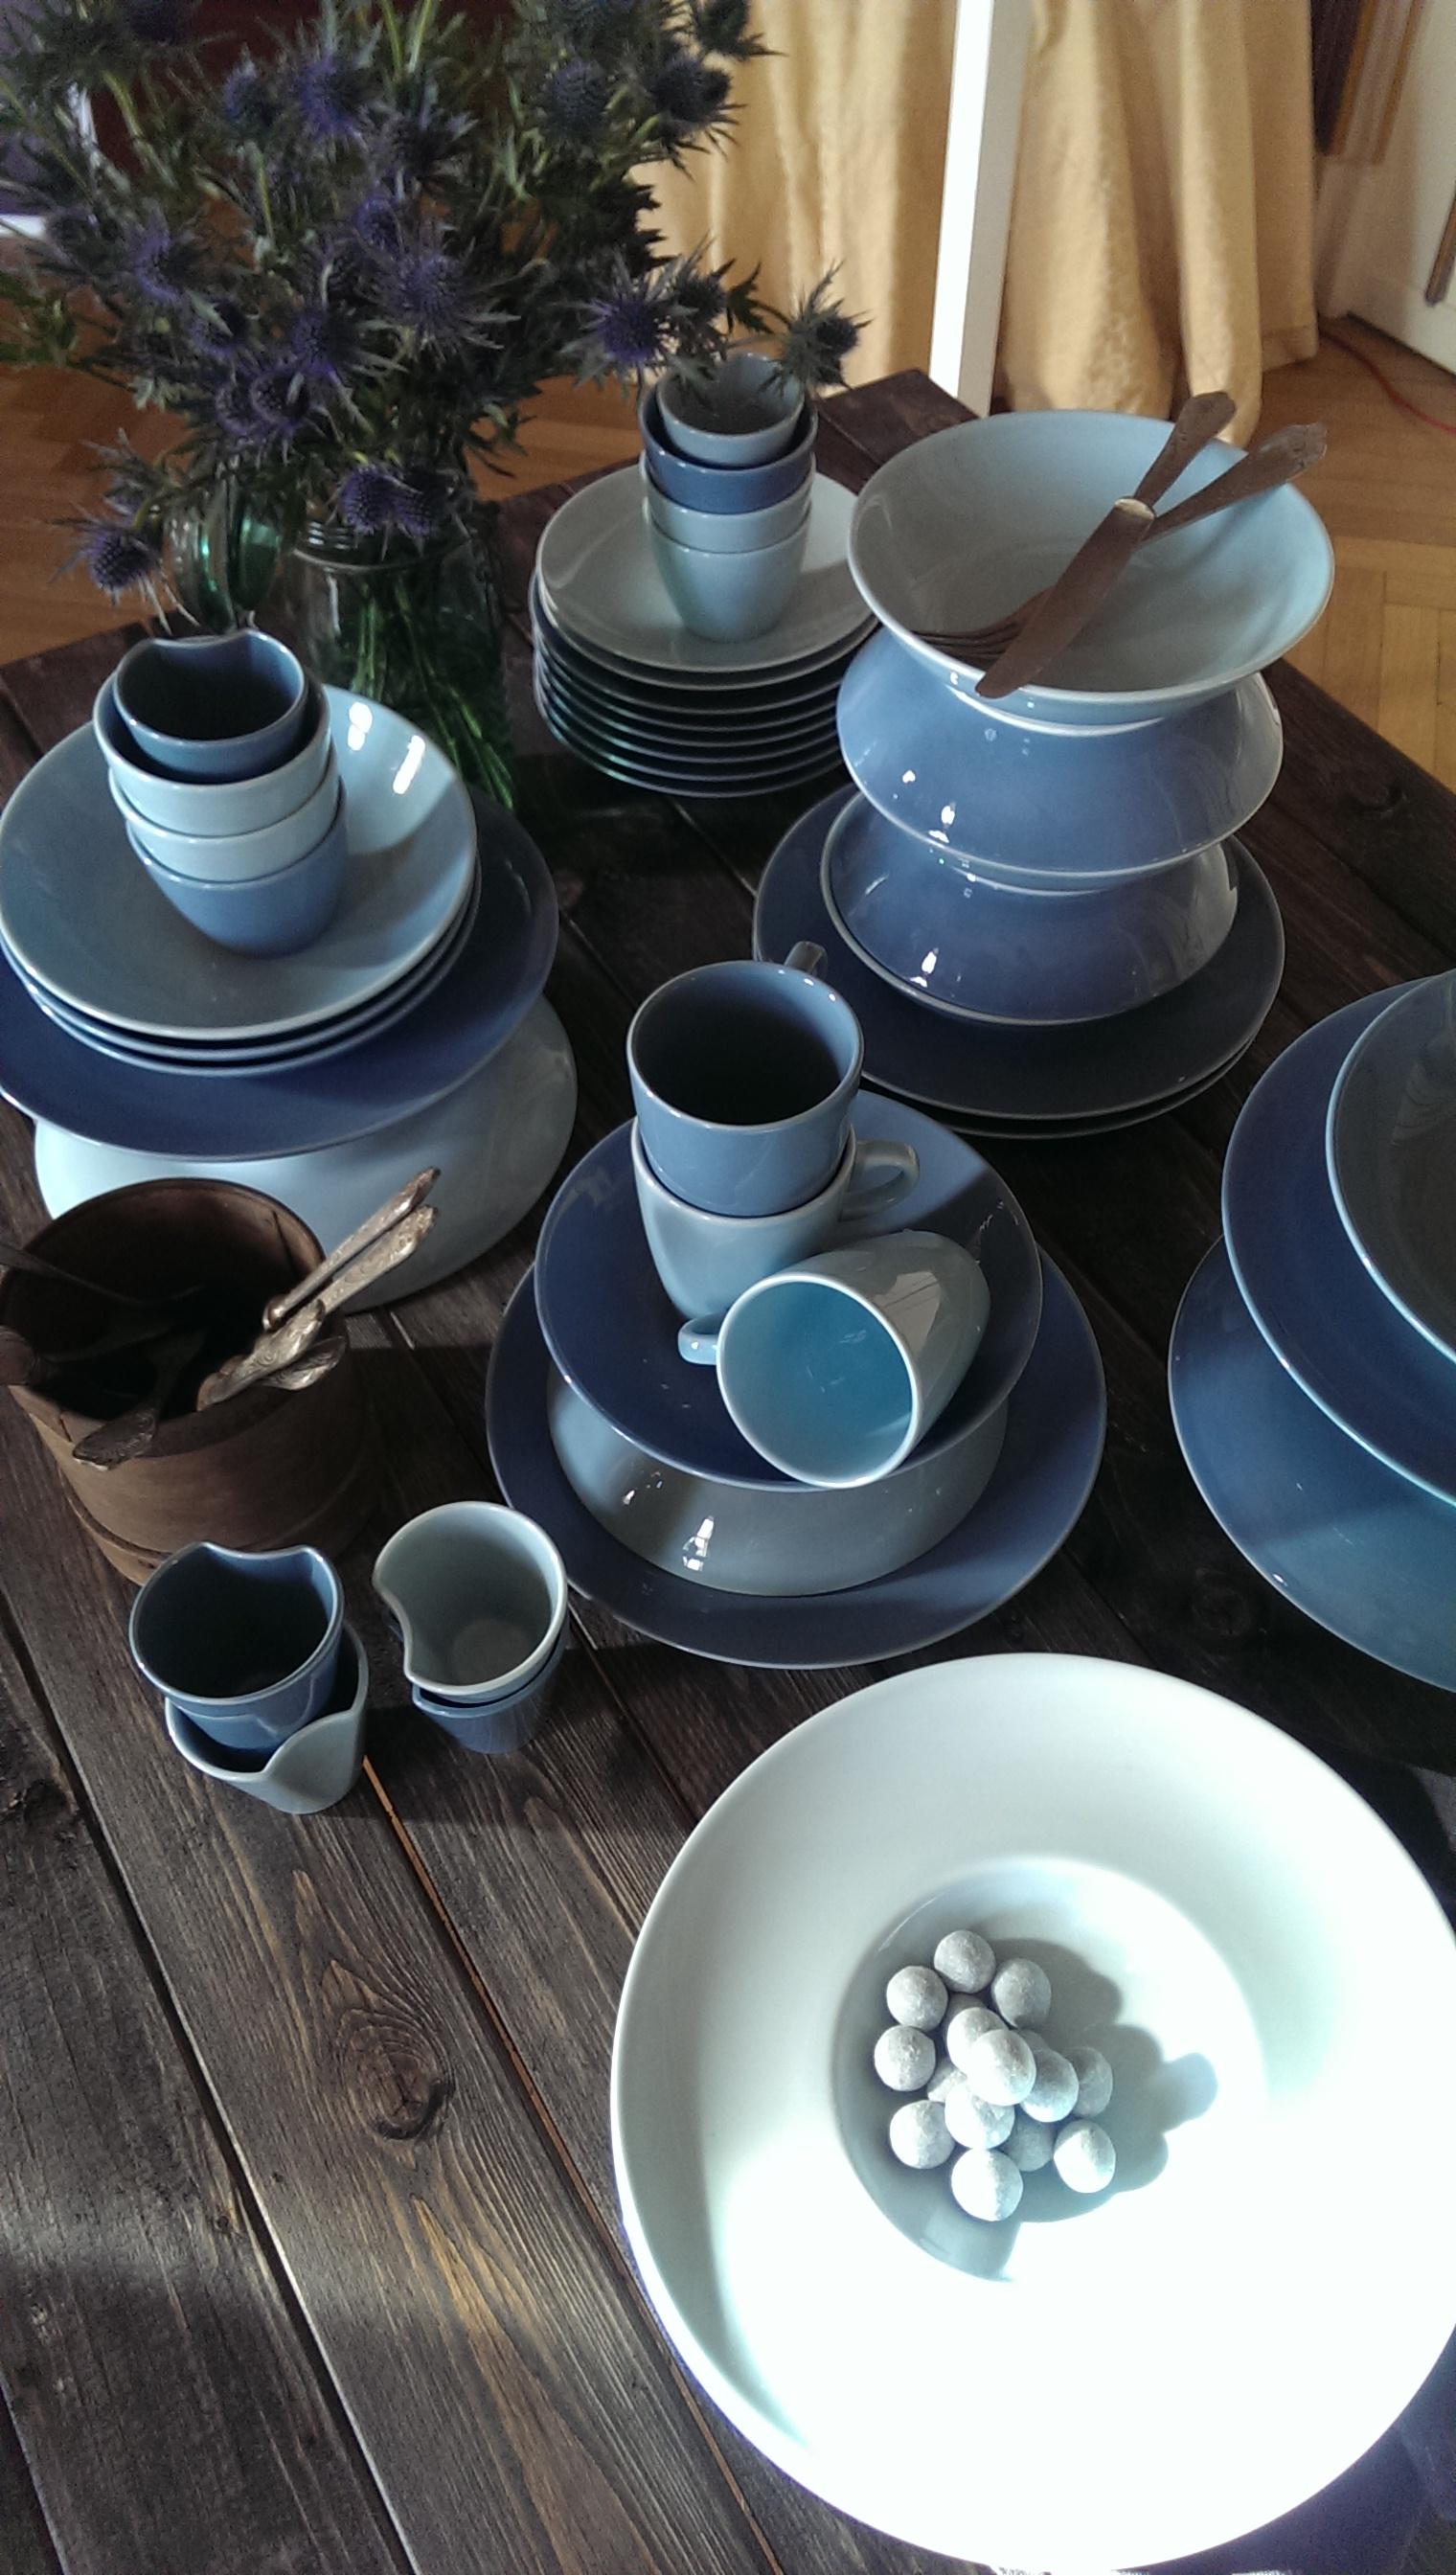 Scintillating Pillivuyt Dinnerware Sets Images - Best Image Engine ... Scintillating Pillivuyt Dinnerware Sets Images Best Image Engine & Charming Pillivuyt Coupe Blue Gallery - Best Image Engine ...